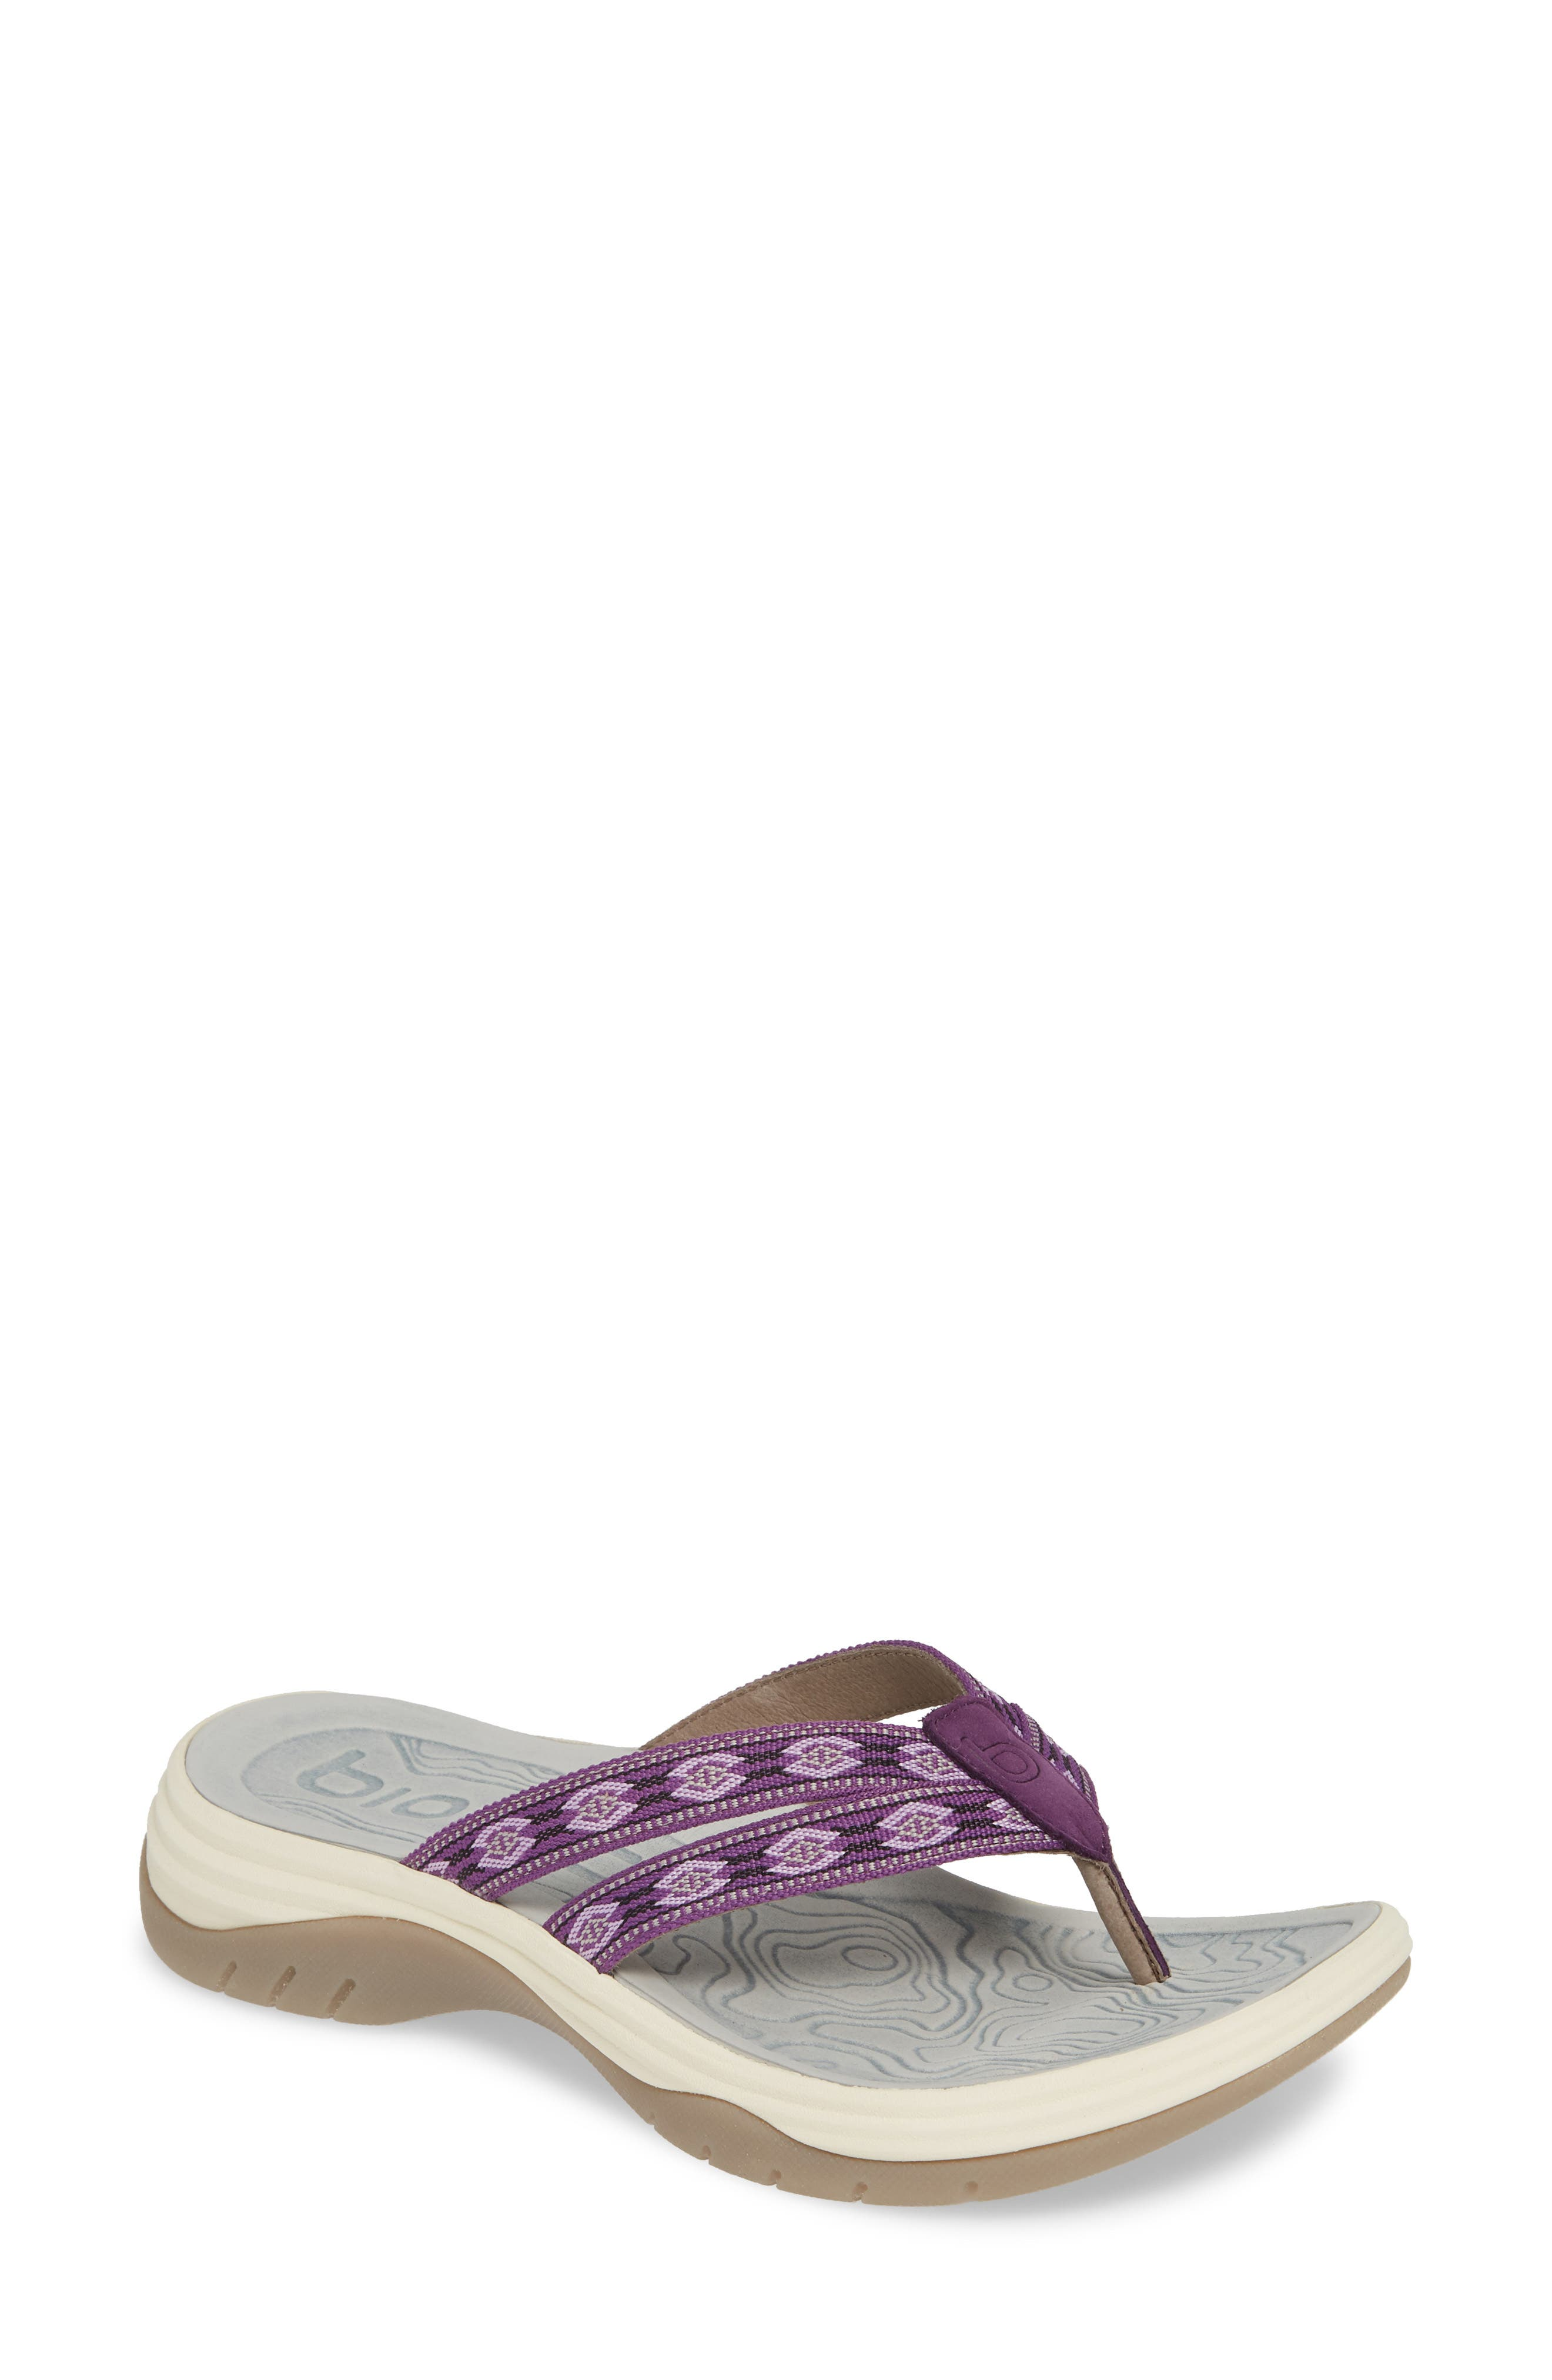 Bionica Nimah Flip Flop, Purple